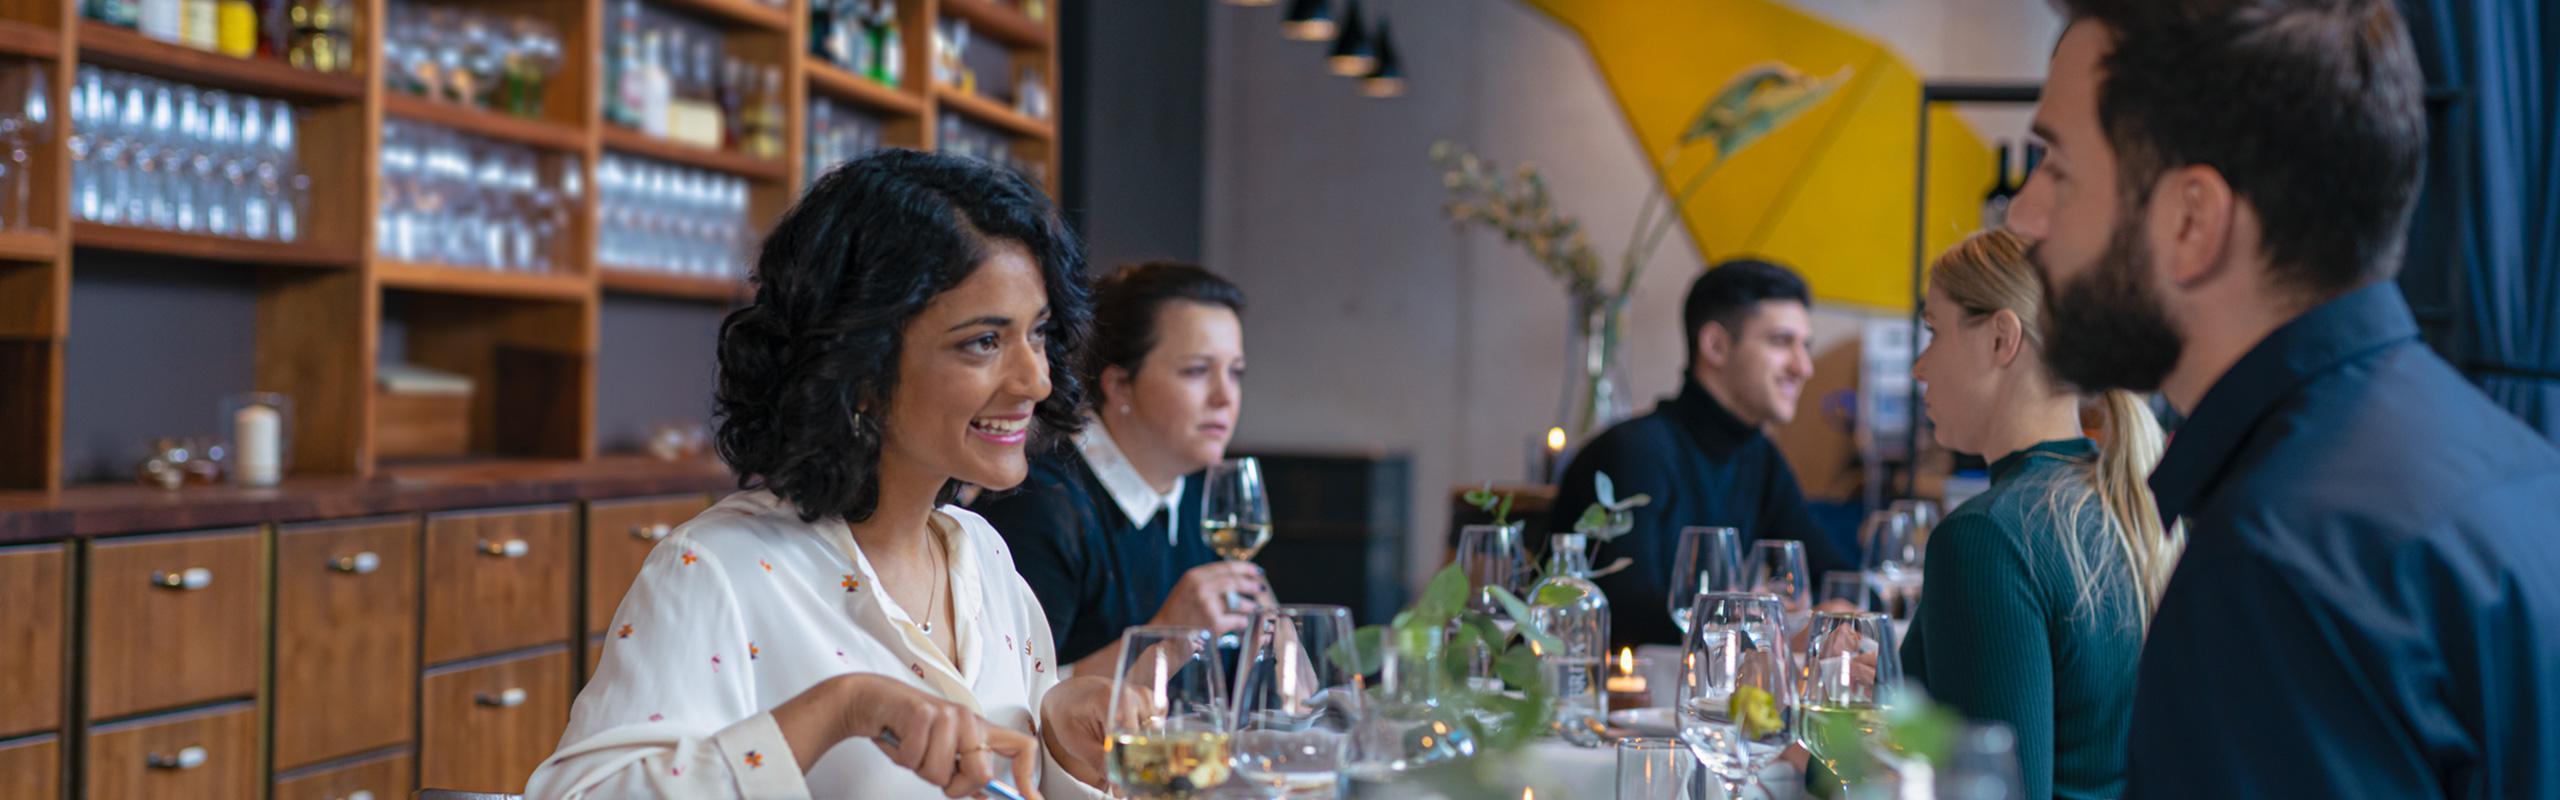 BRITA fine dining sushi